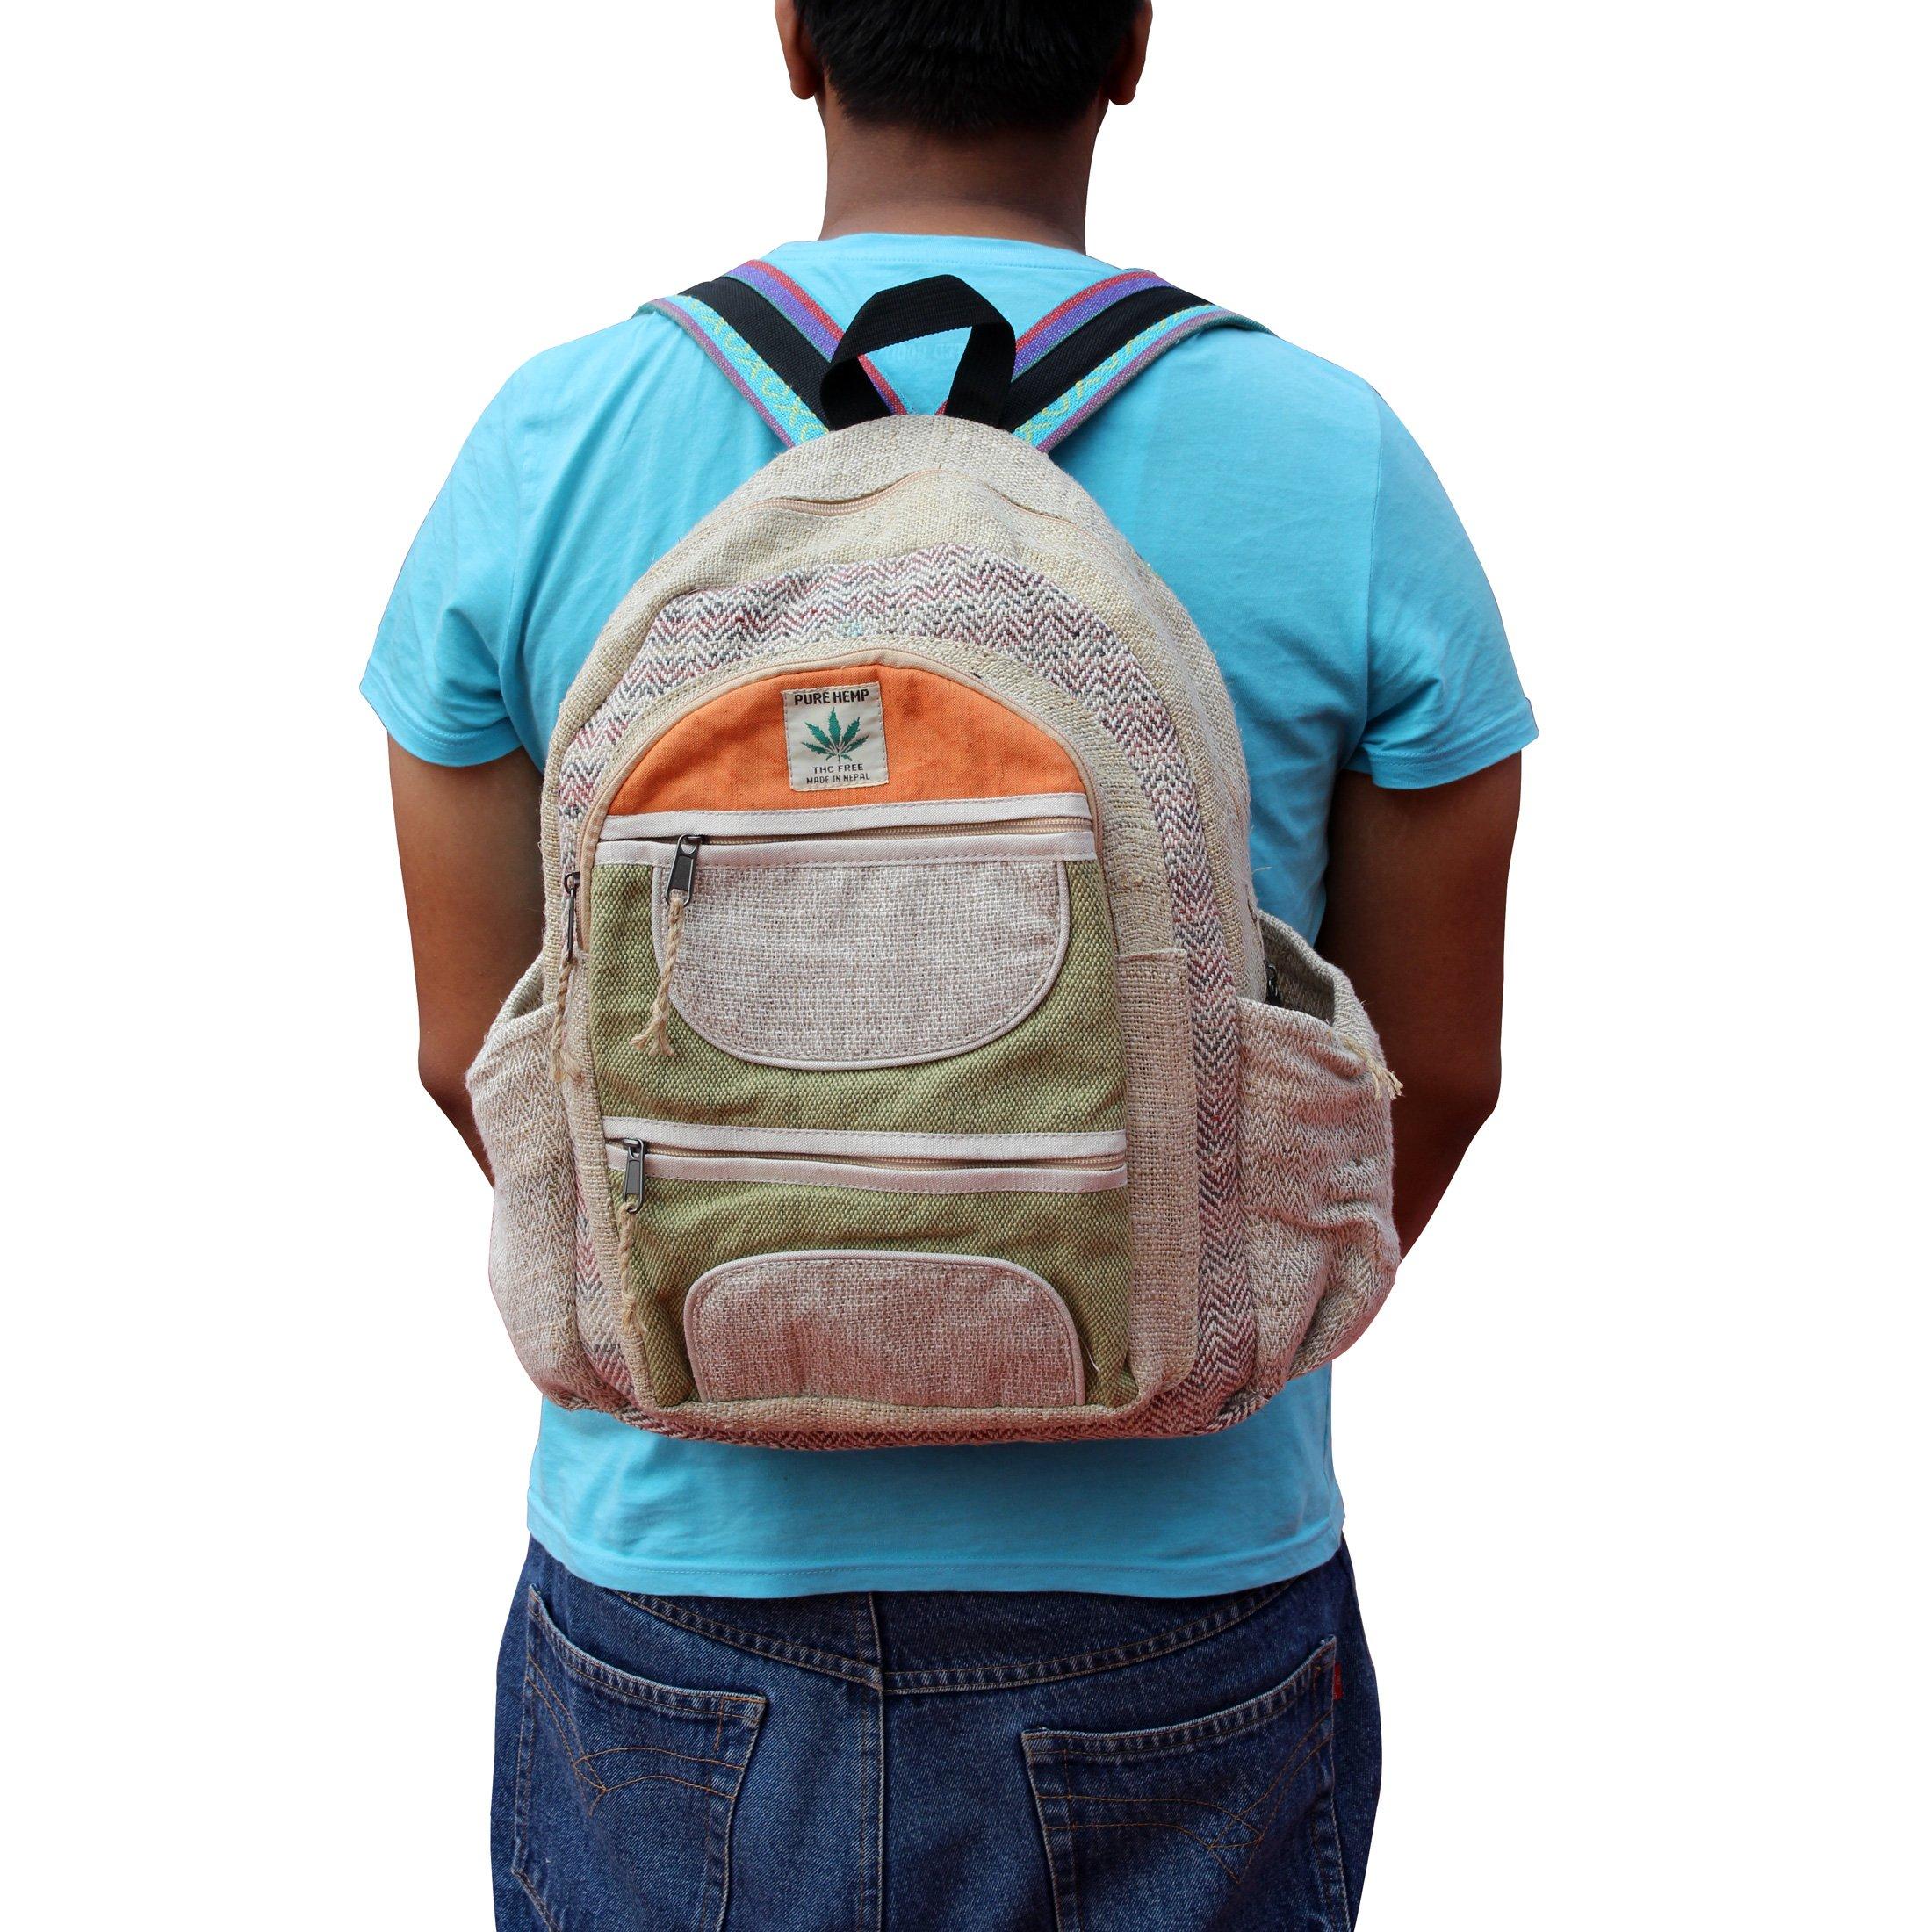 Maha Bodhi All Natural Handmade Multi Pocket Laptop Backpack - Himalayan Hemp by Maha Bodhi (Image #4)